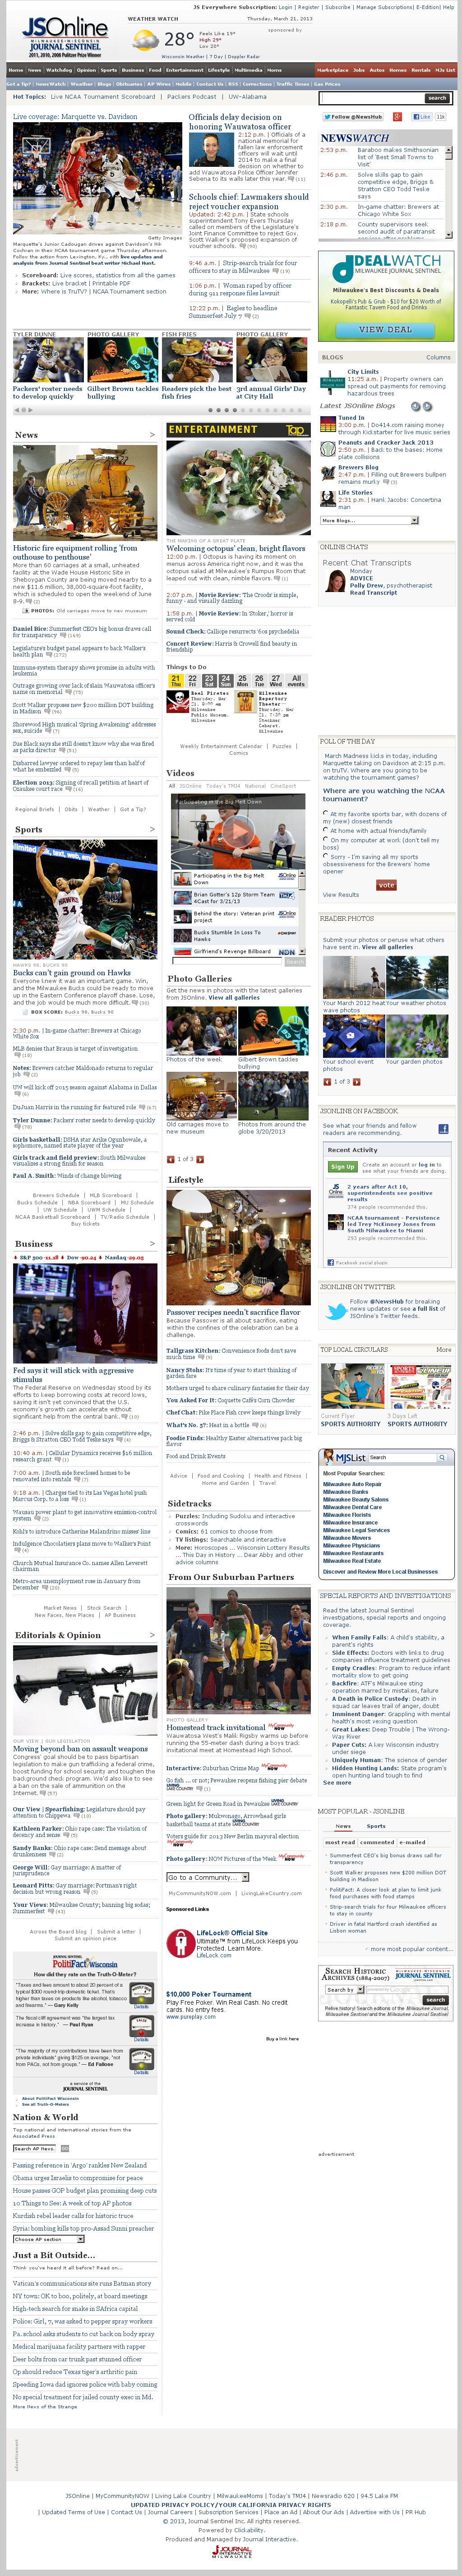 Milwaukee Journal Sentinel at Thursday March 21, 2013, 8:13 p.m. UTC